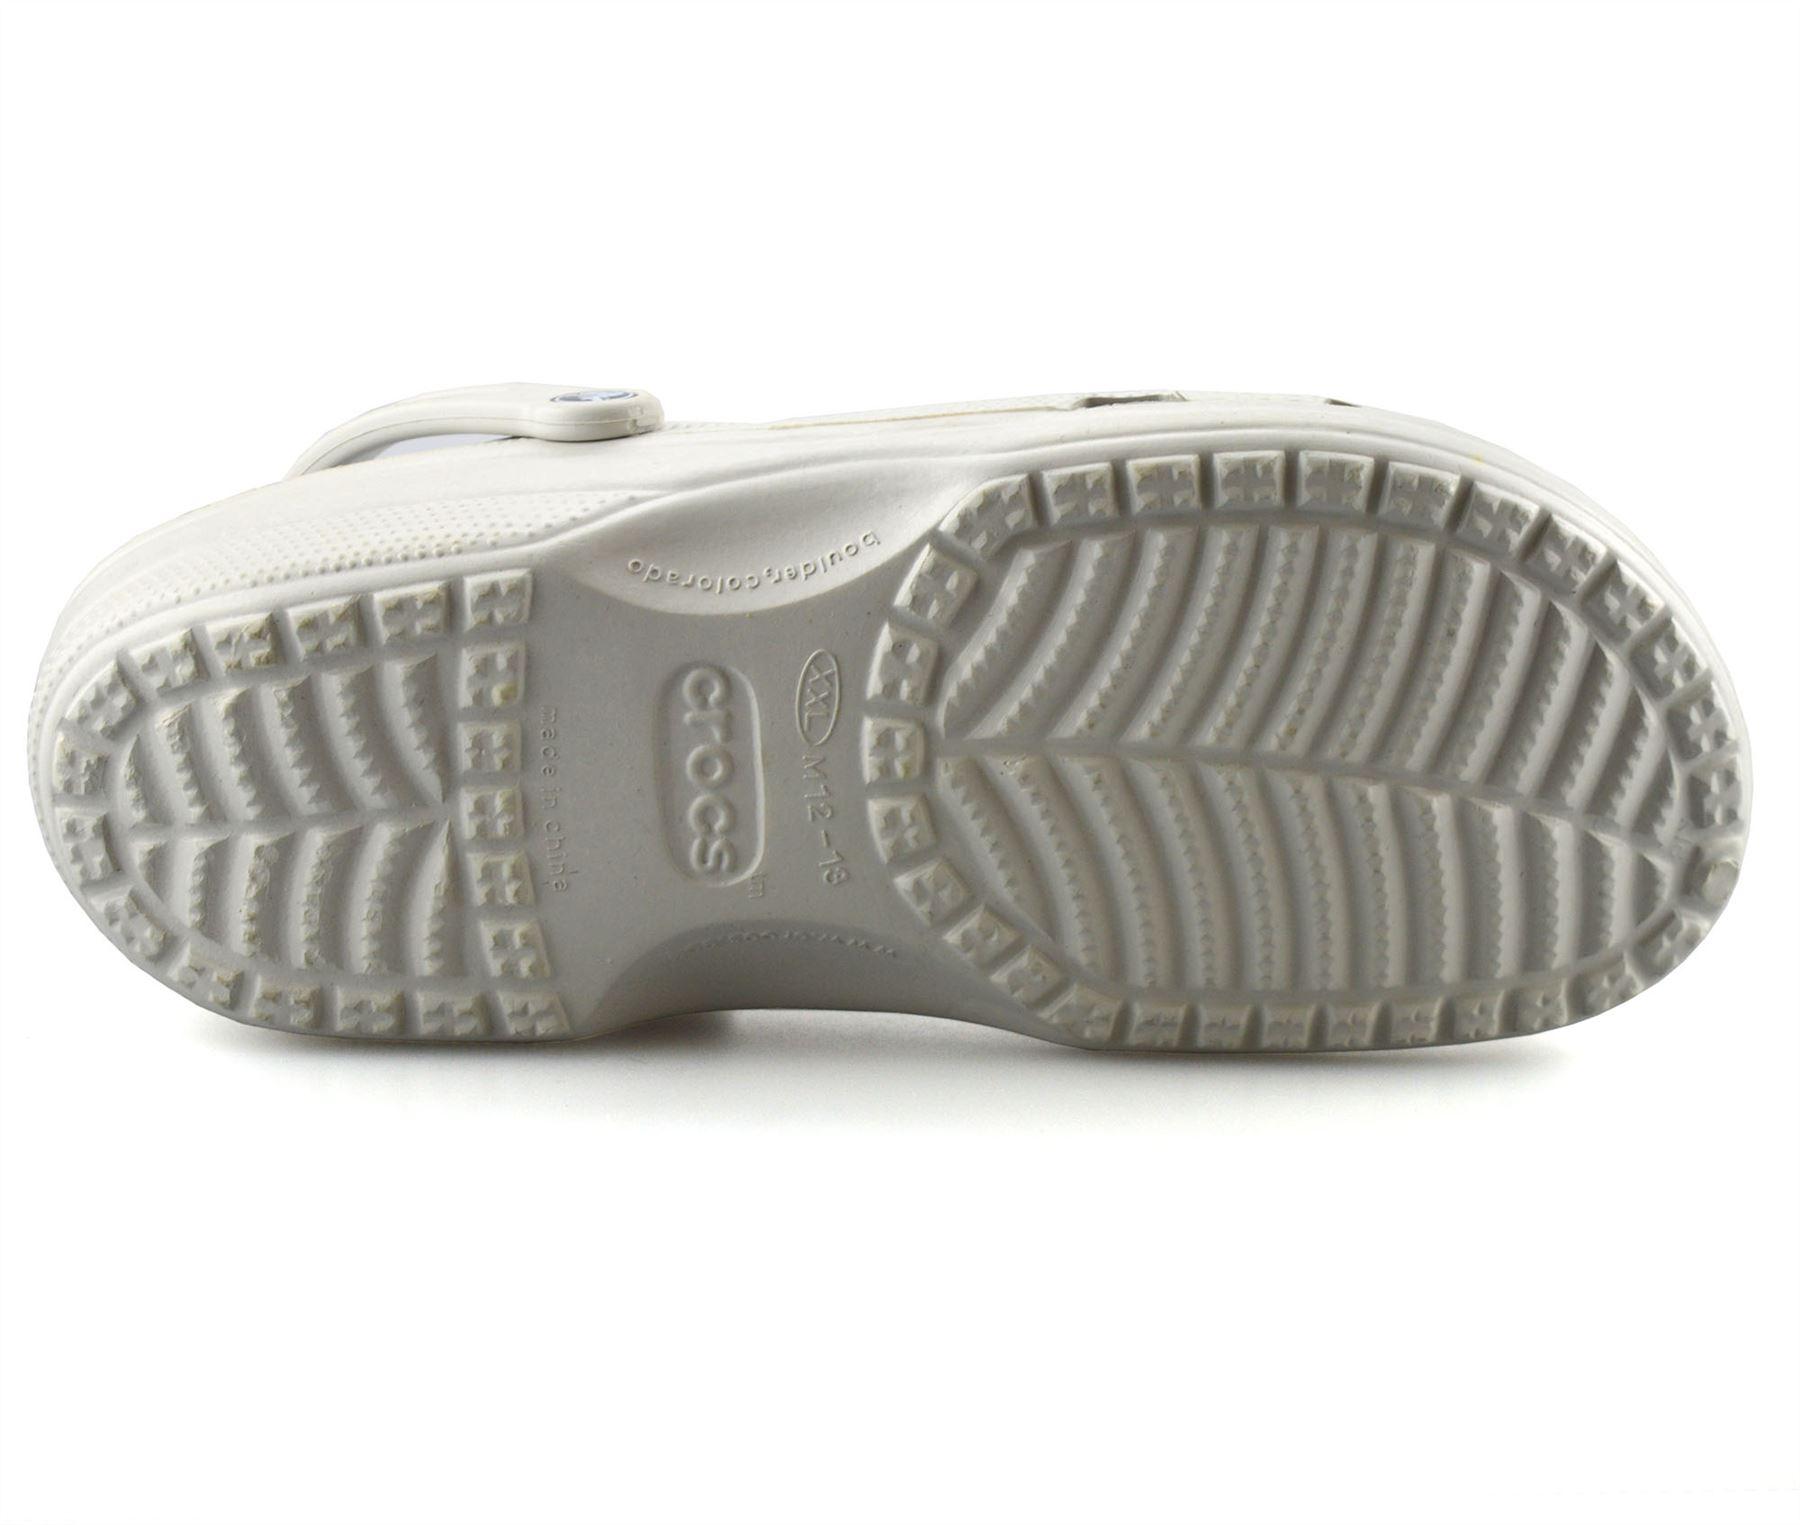 Para-Hombre-Verano-Playa-Mulas-Zuecos-Crocs-Caminar-Deportes-Senderismo-Sandalias-Zapatos-Talla